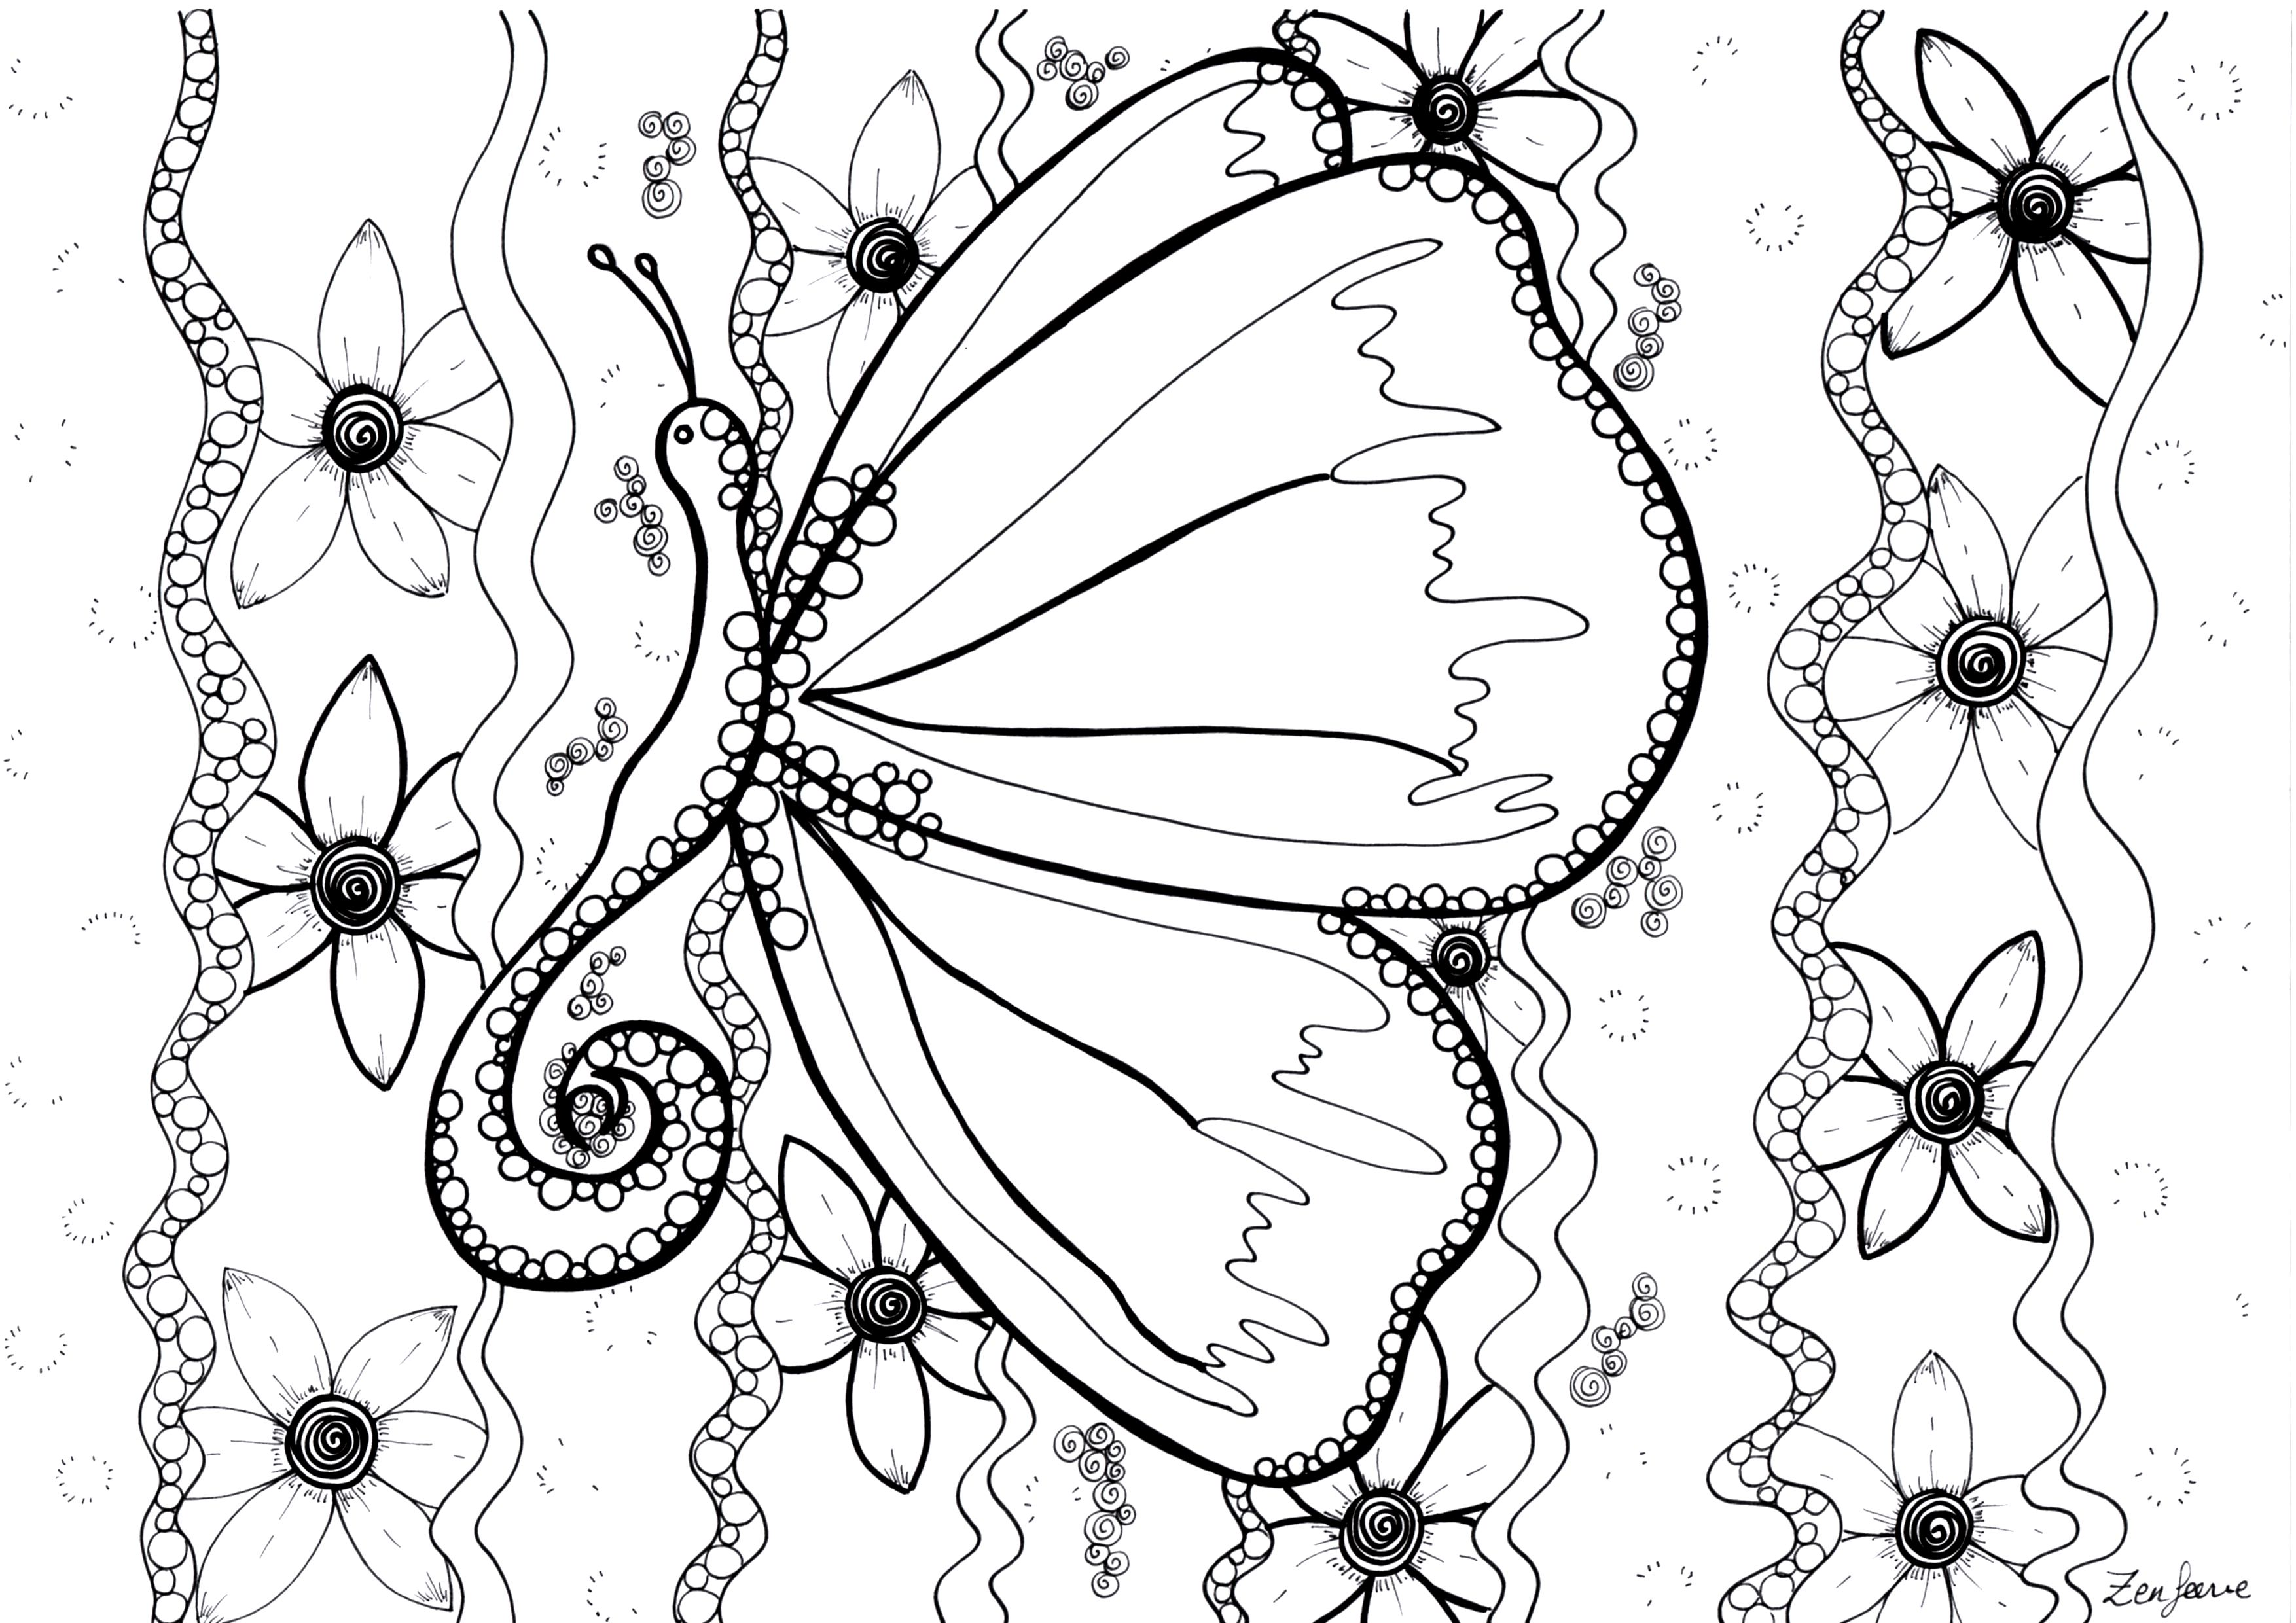 Un joli papillon style Zentangle